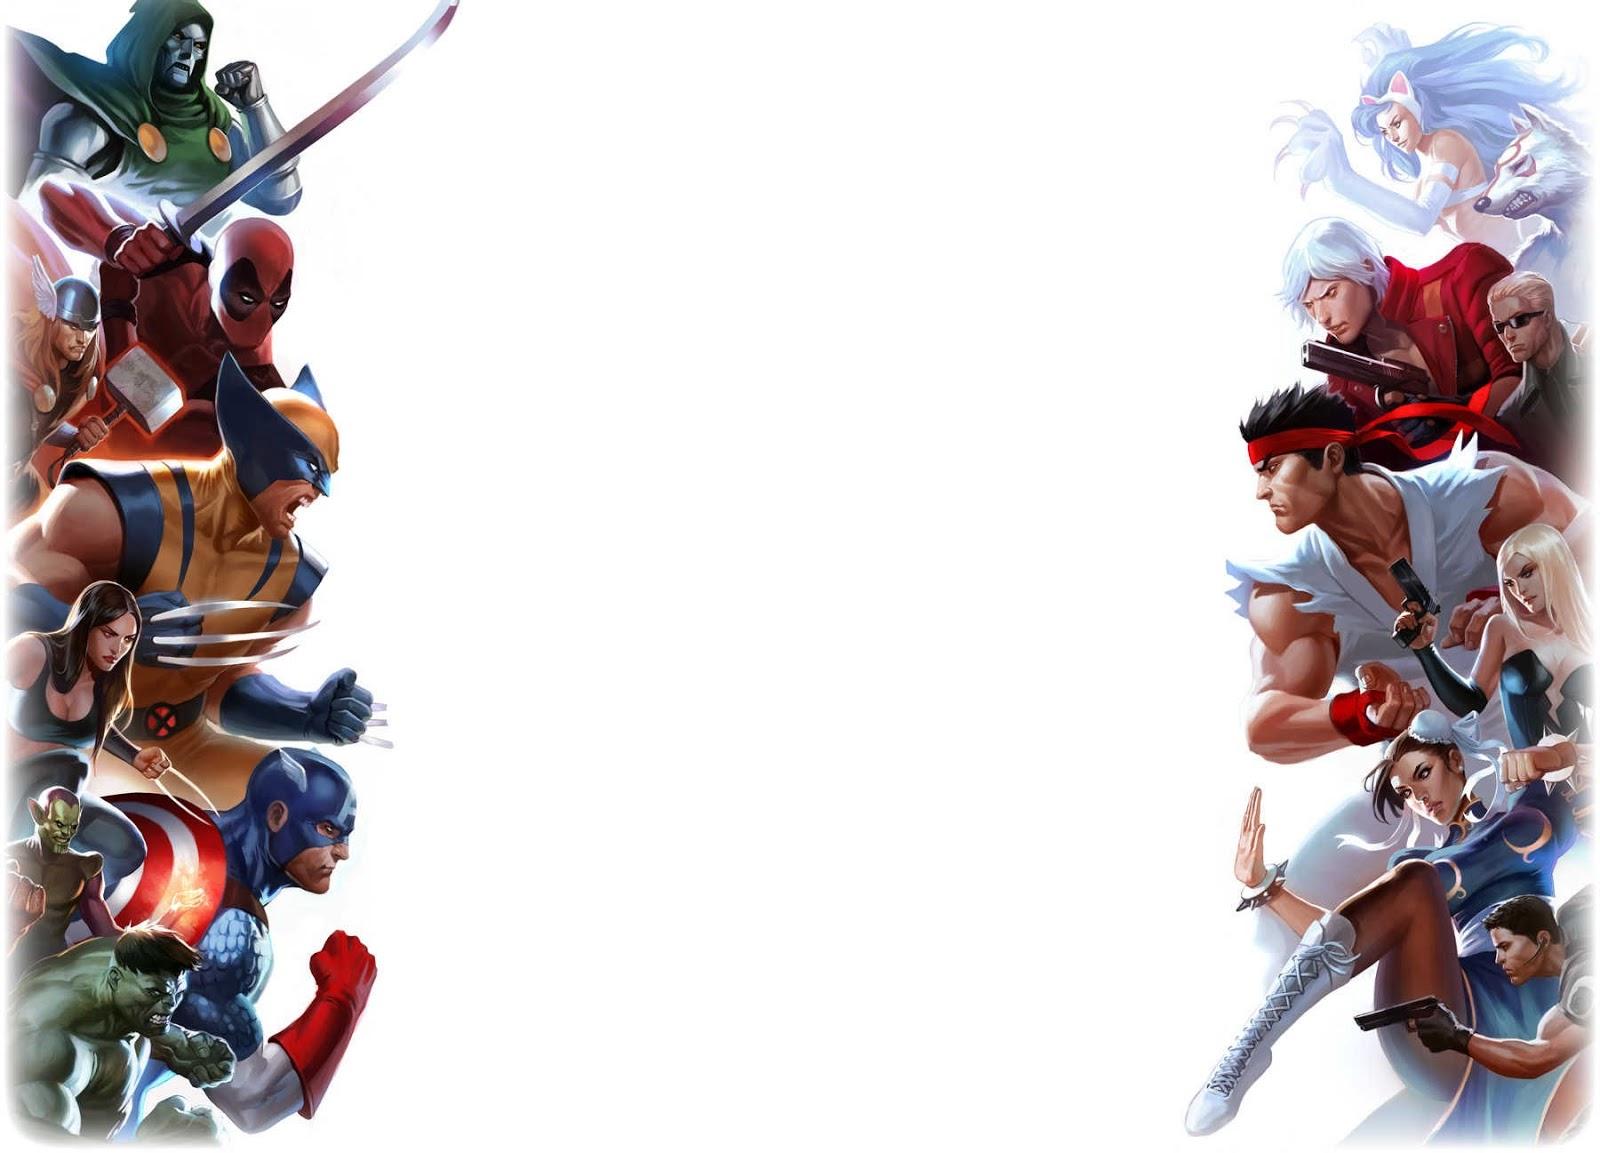 http://2.bp.blogspot.com/-WdxyOUyMrAo/UYALYNn_SGI/AAAAAAAACD8/cgagxrpBqUA/s1600/Marvel_Vs_Capcom_3_wallpaper.jpg